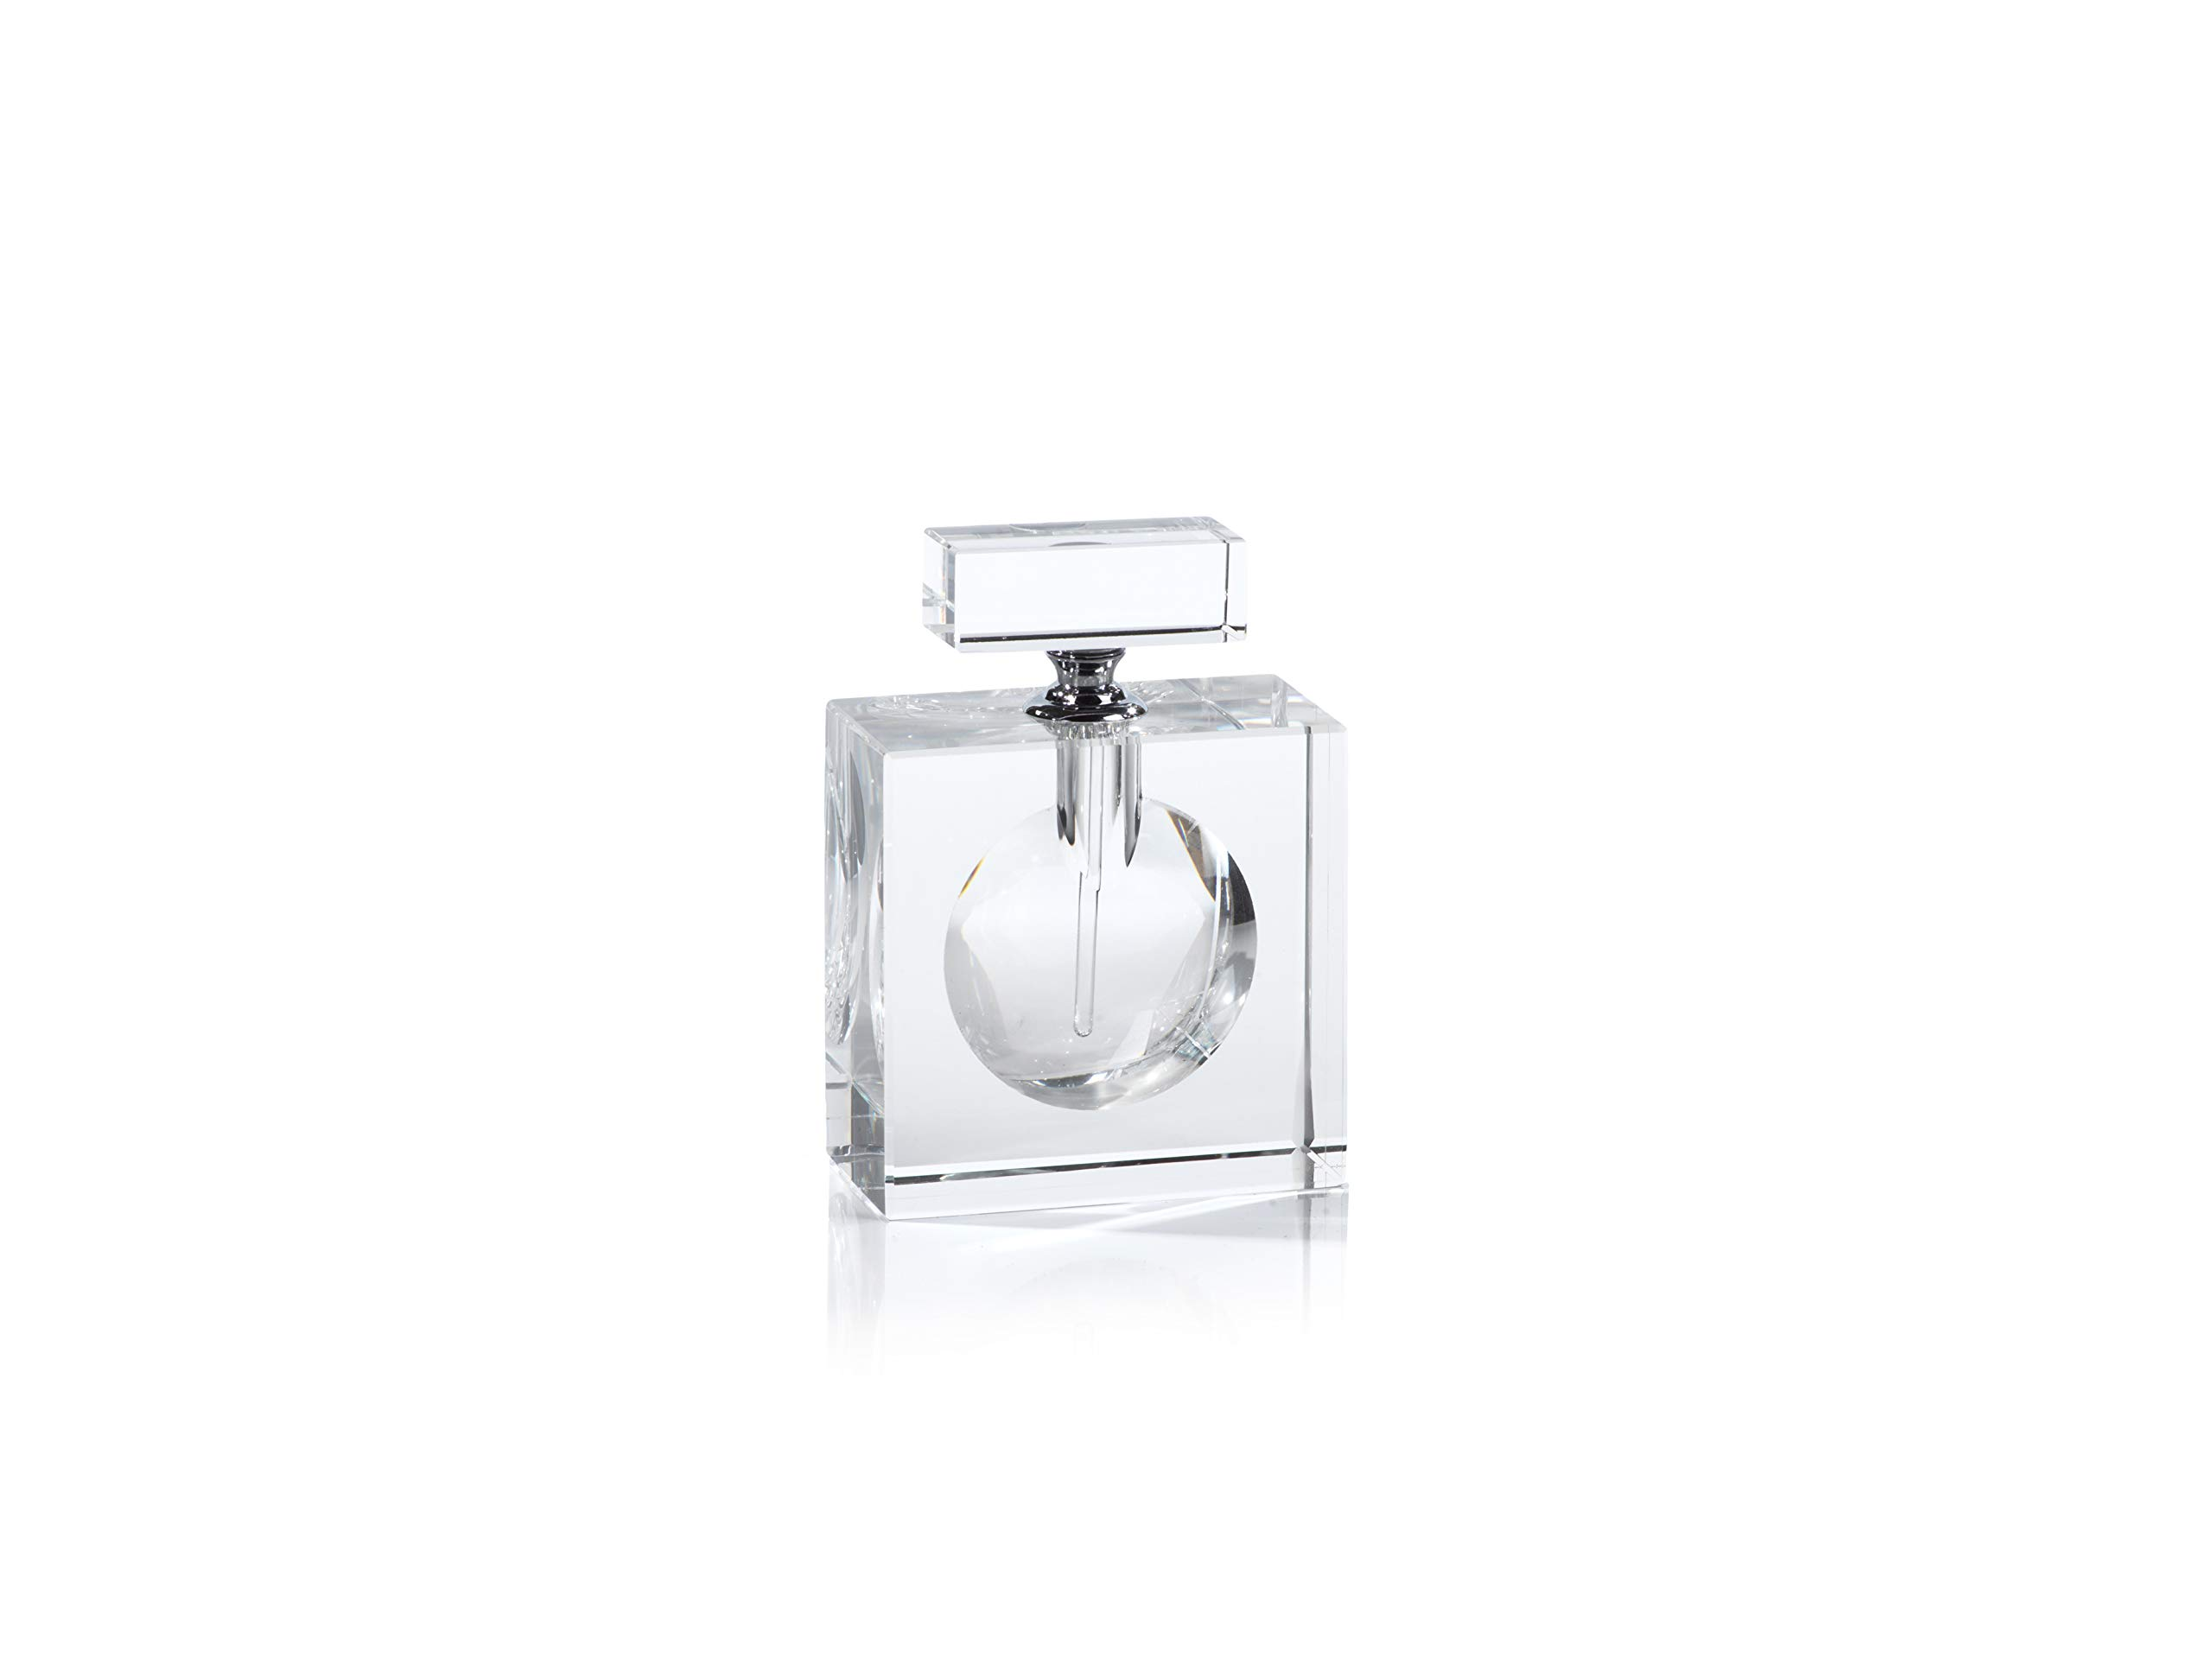 Zodax Malak Rectangular Glass Perfume Decorative Bottle, Clear by Zodax